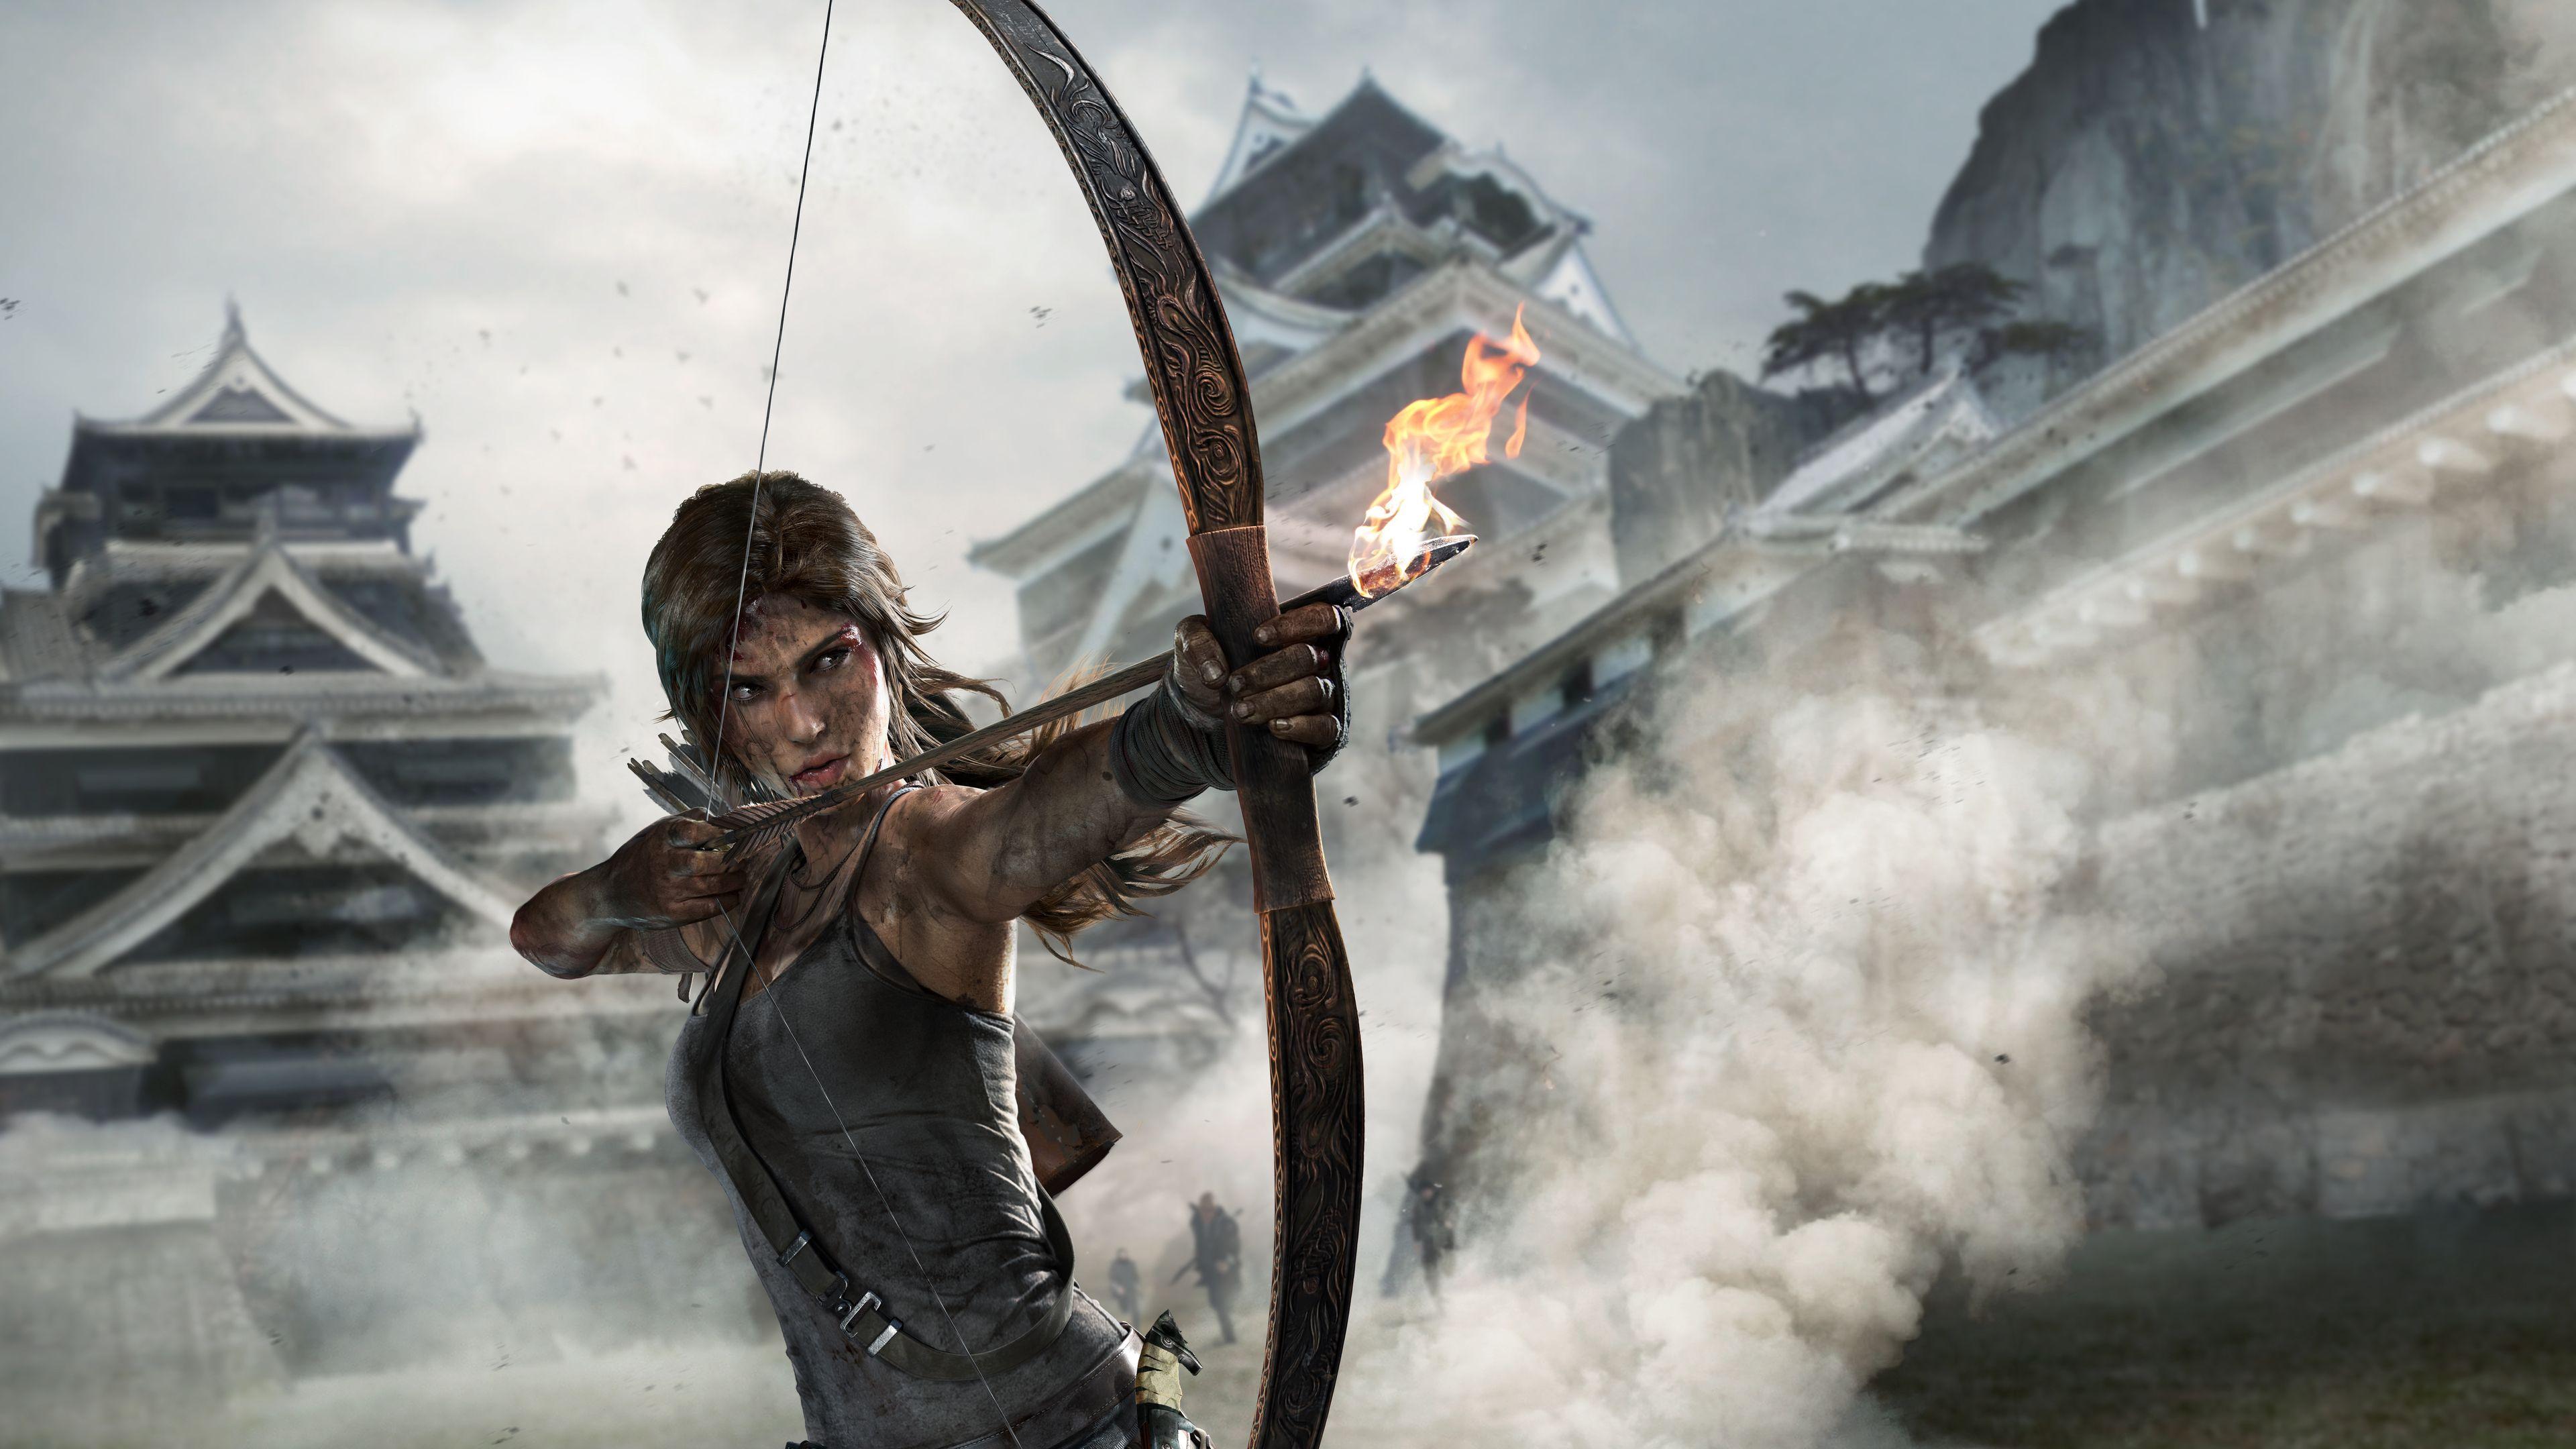 Tomb Raider Definitive Edition Tomb Raider Wallpapers Lara Croft Wallpapers Hd Wallpapers Games Tomb Raider Wallpaper Raiders Wallpaper Lara Croft Wallpaper